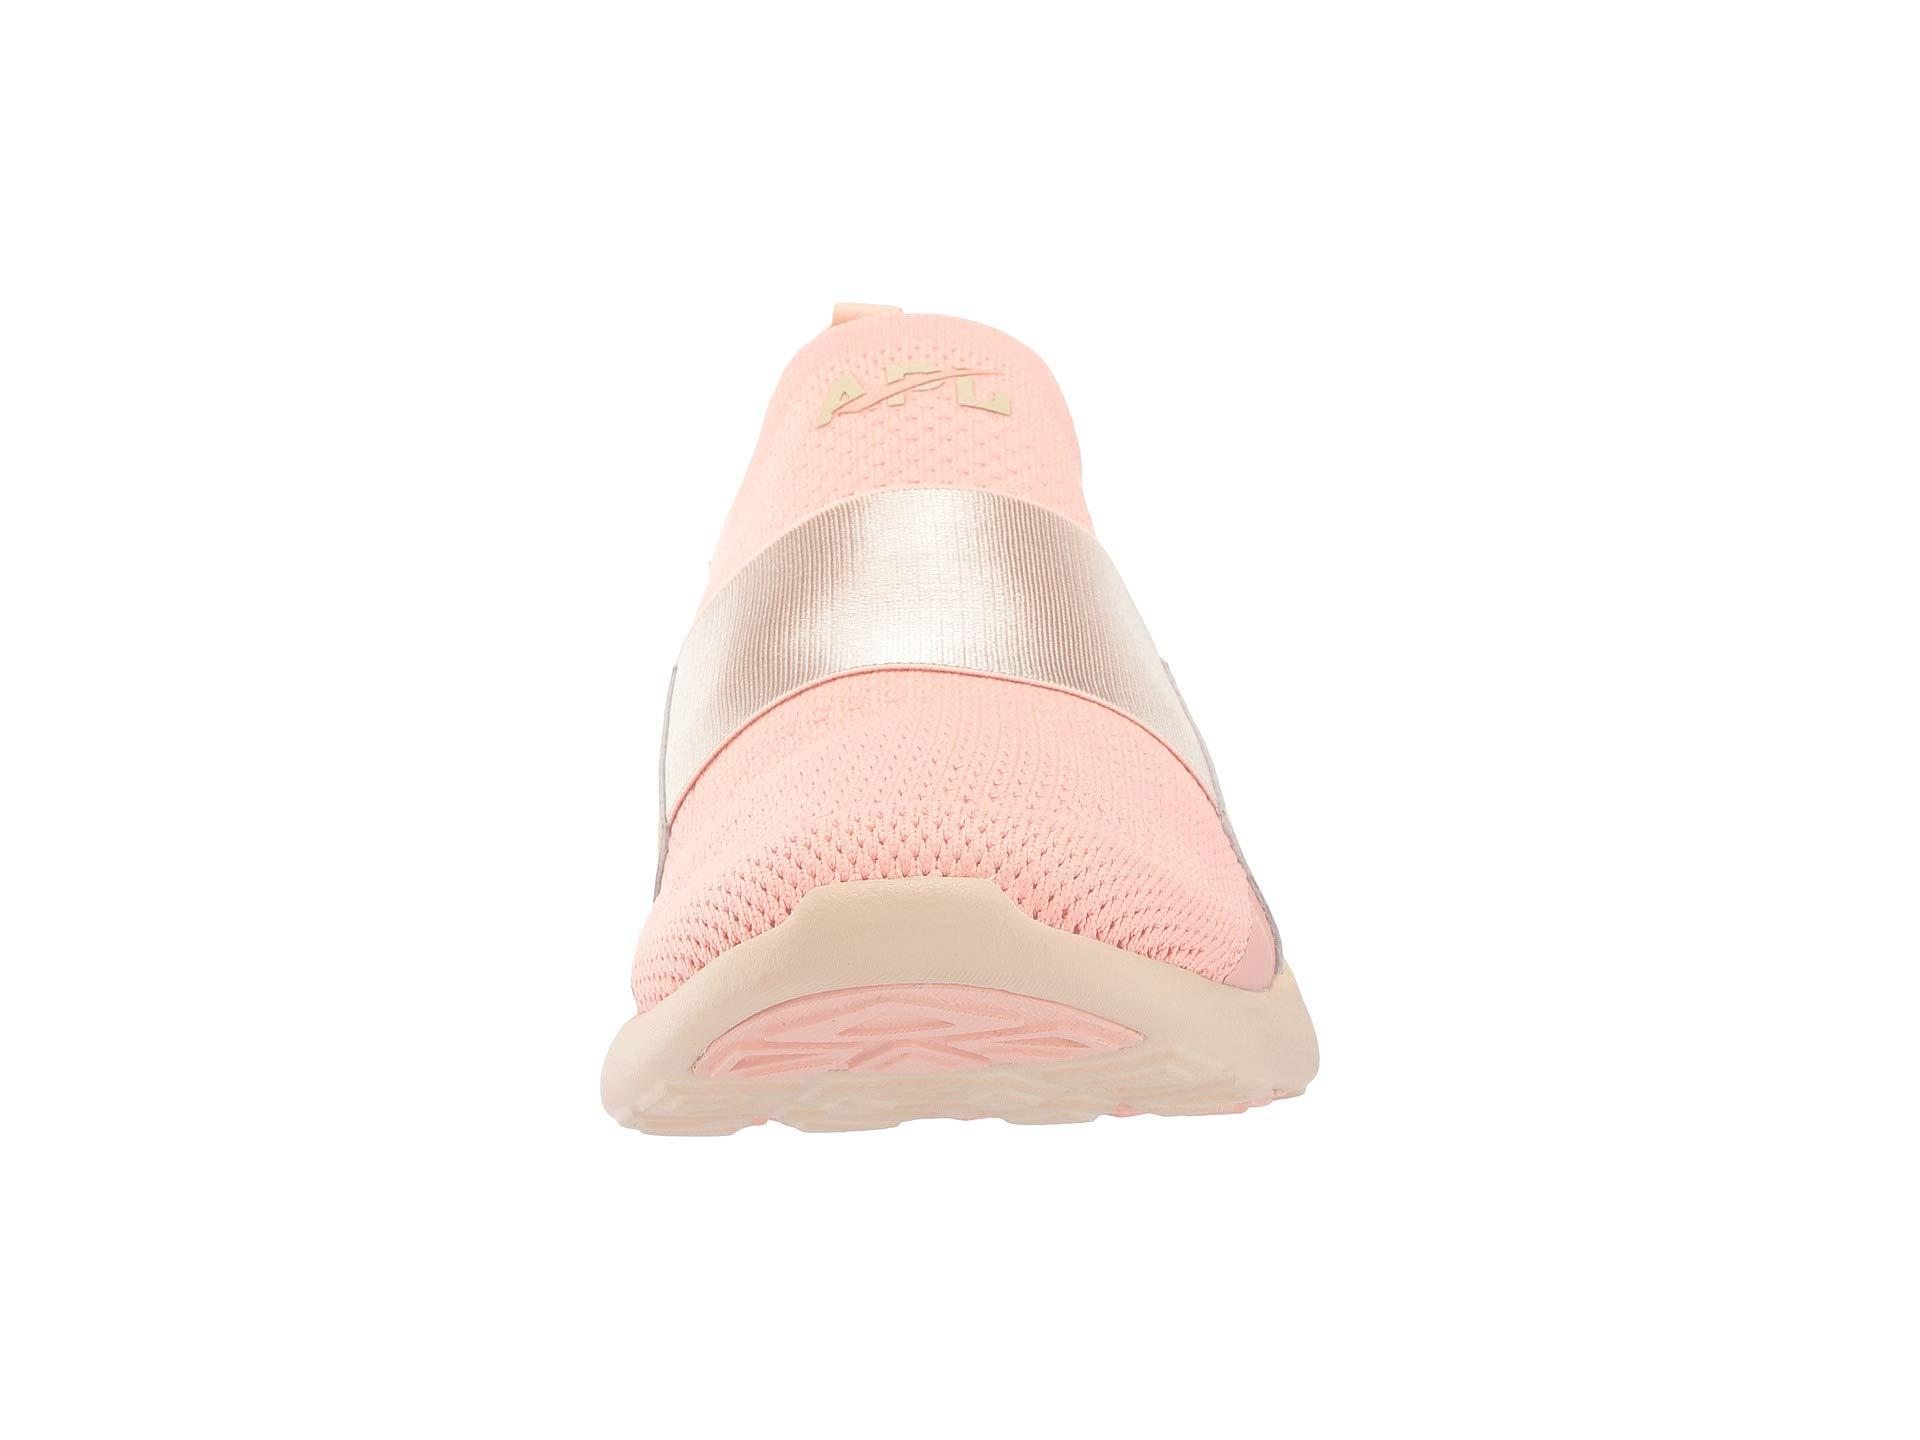 Bliss Propulsion Techloom cream apl Athletic Labs Blush 8zwIqda1x